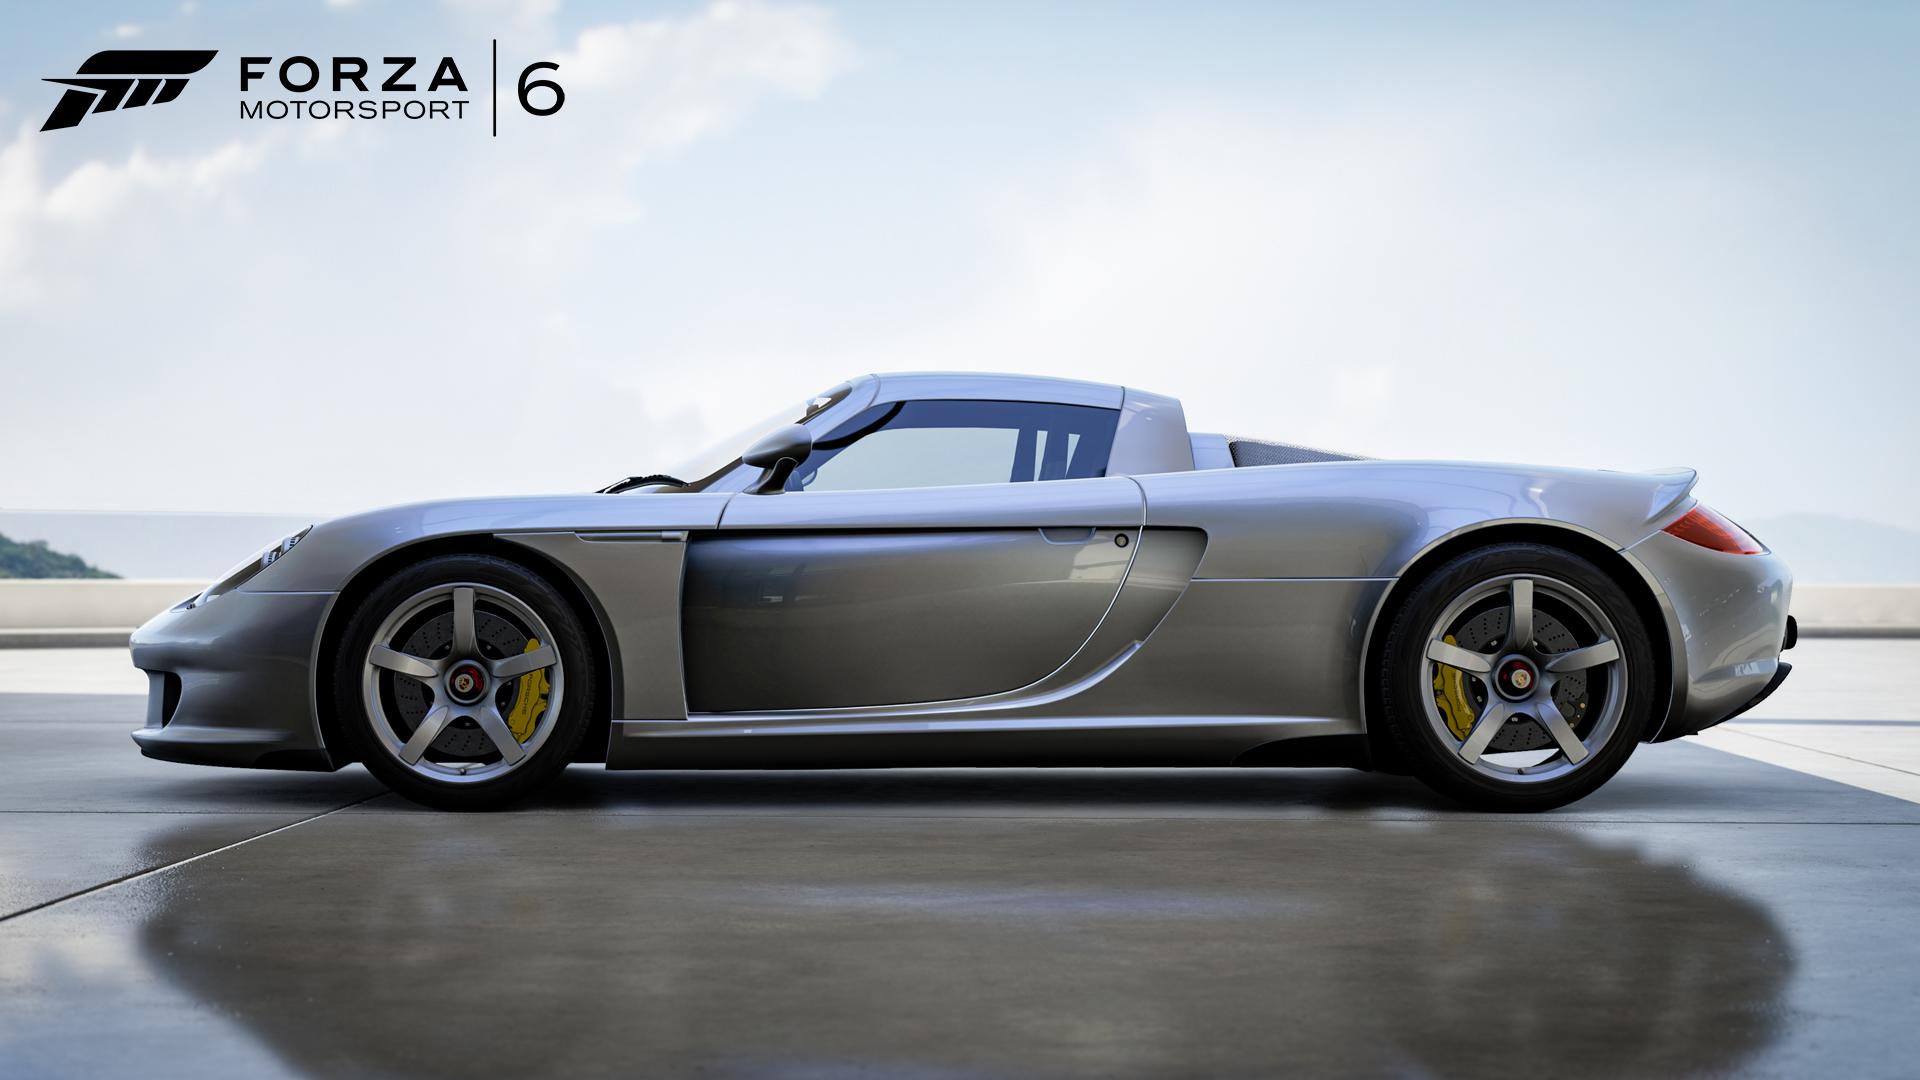 Porsche expansion pack forza 6